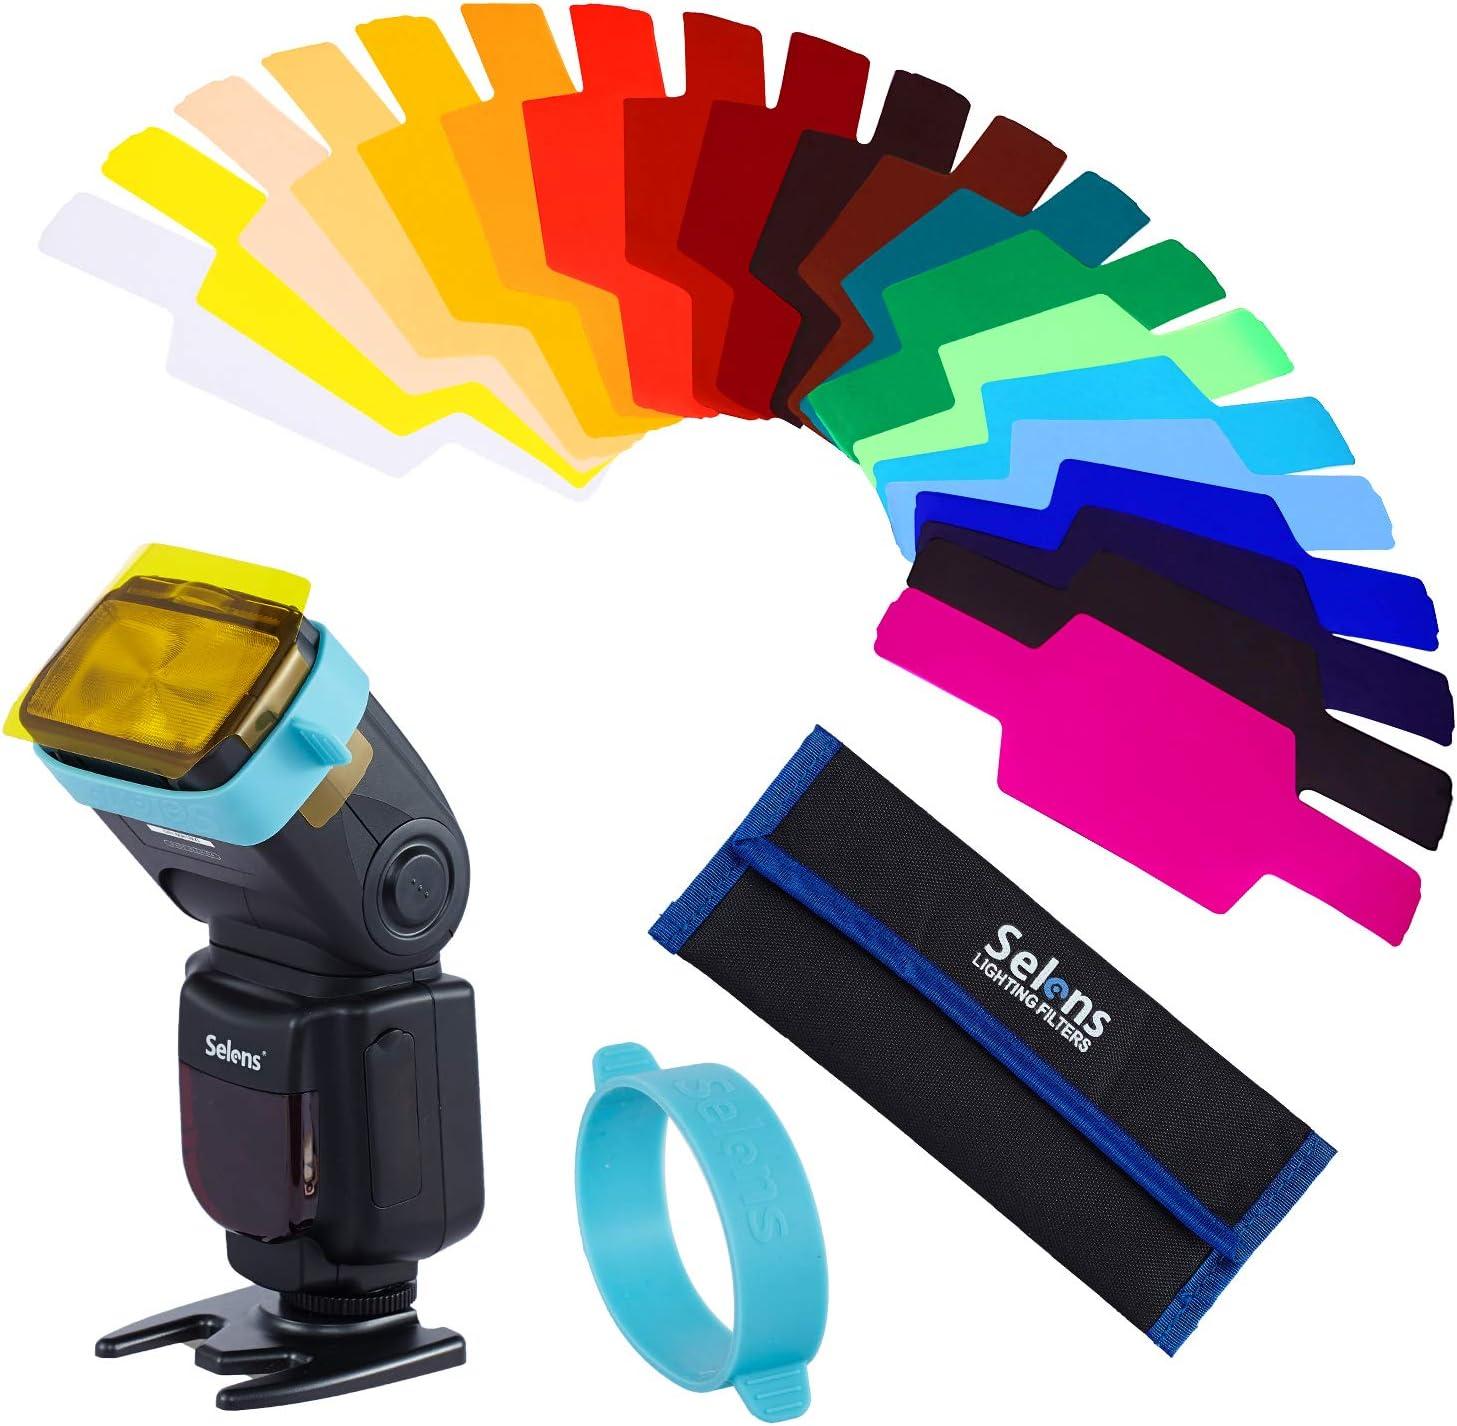 Filtros para Flash de Cámara (20 colores) Canon, Nikon, Sony